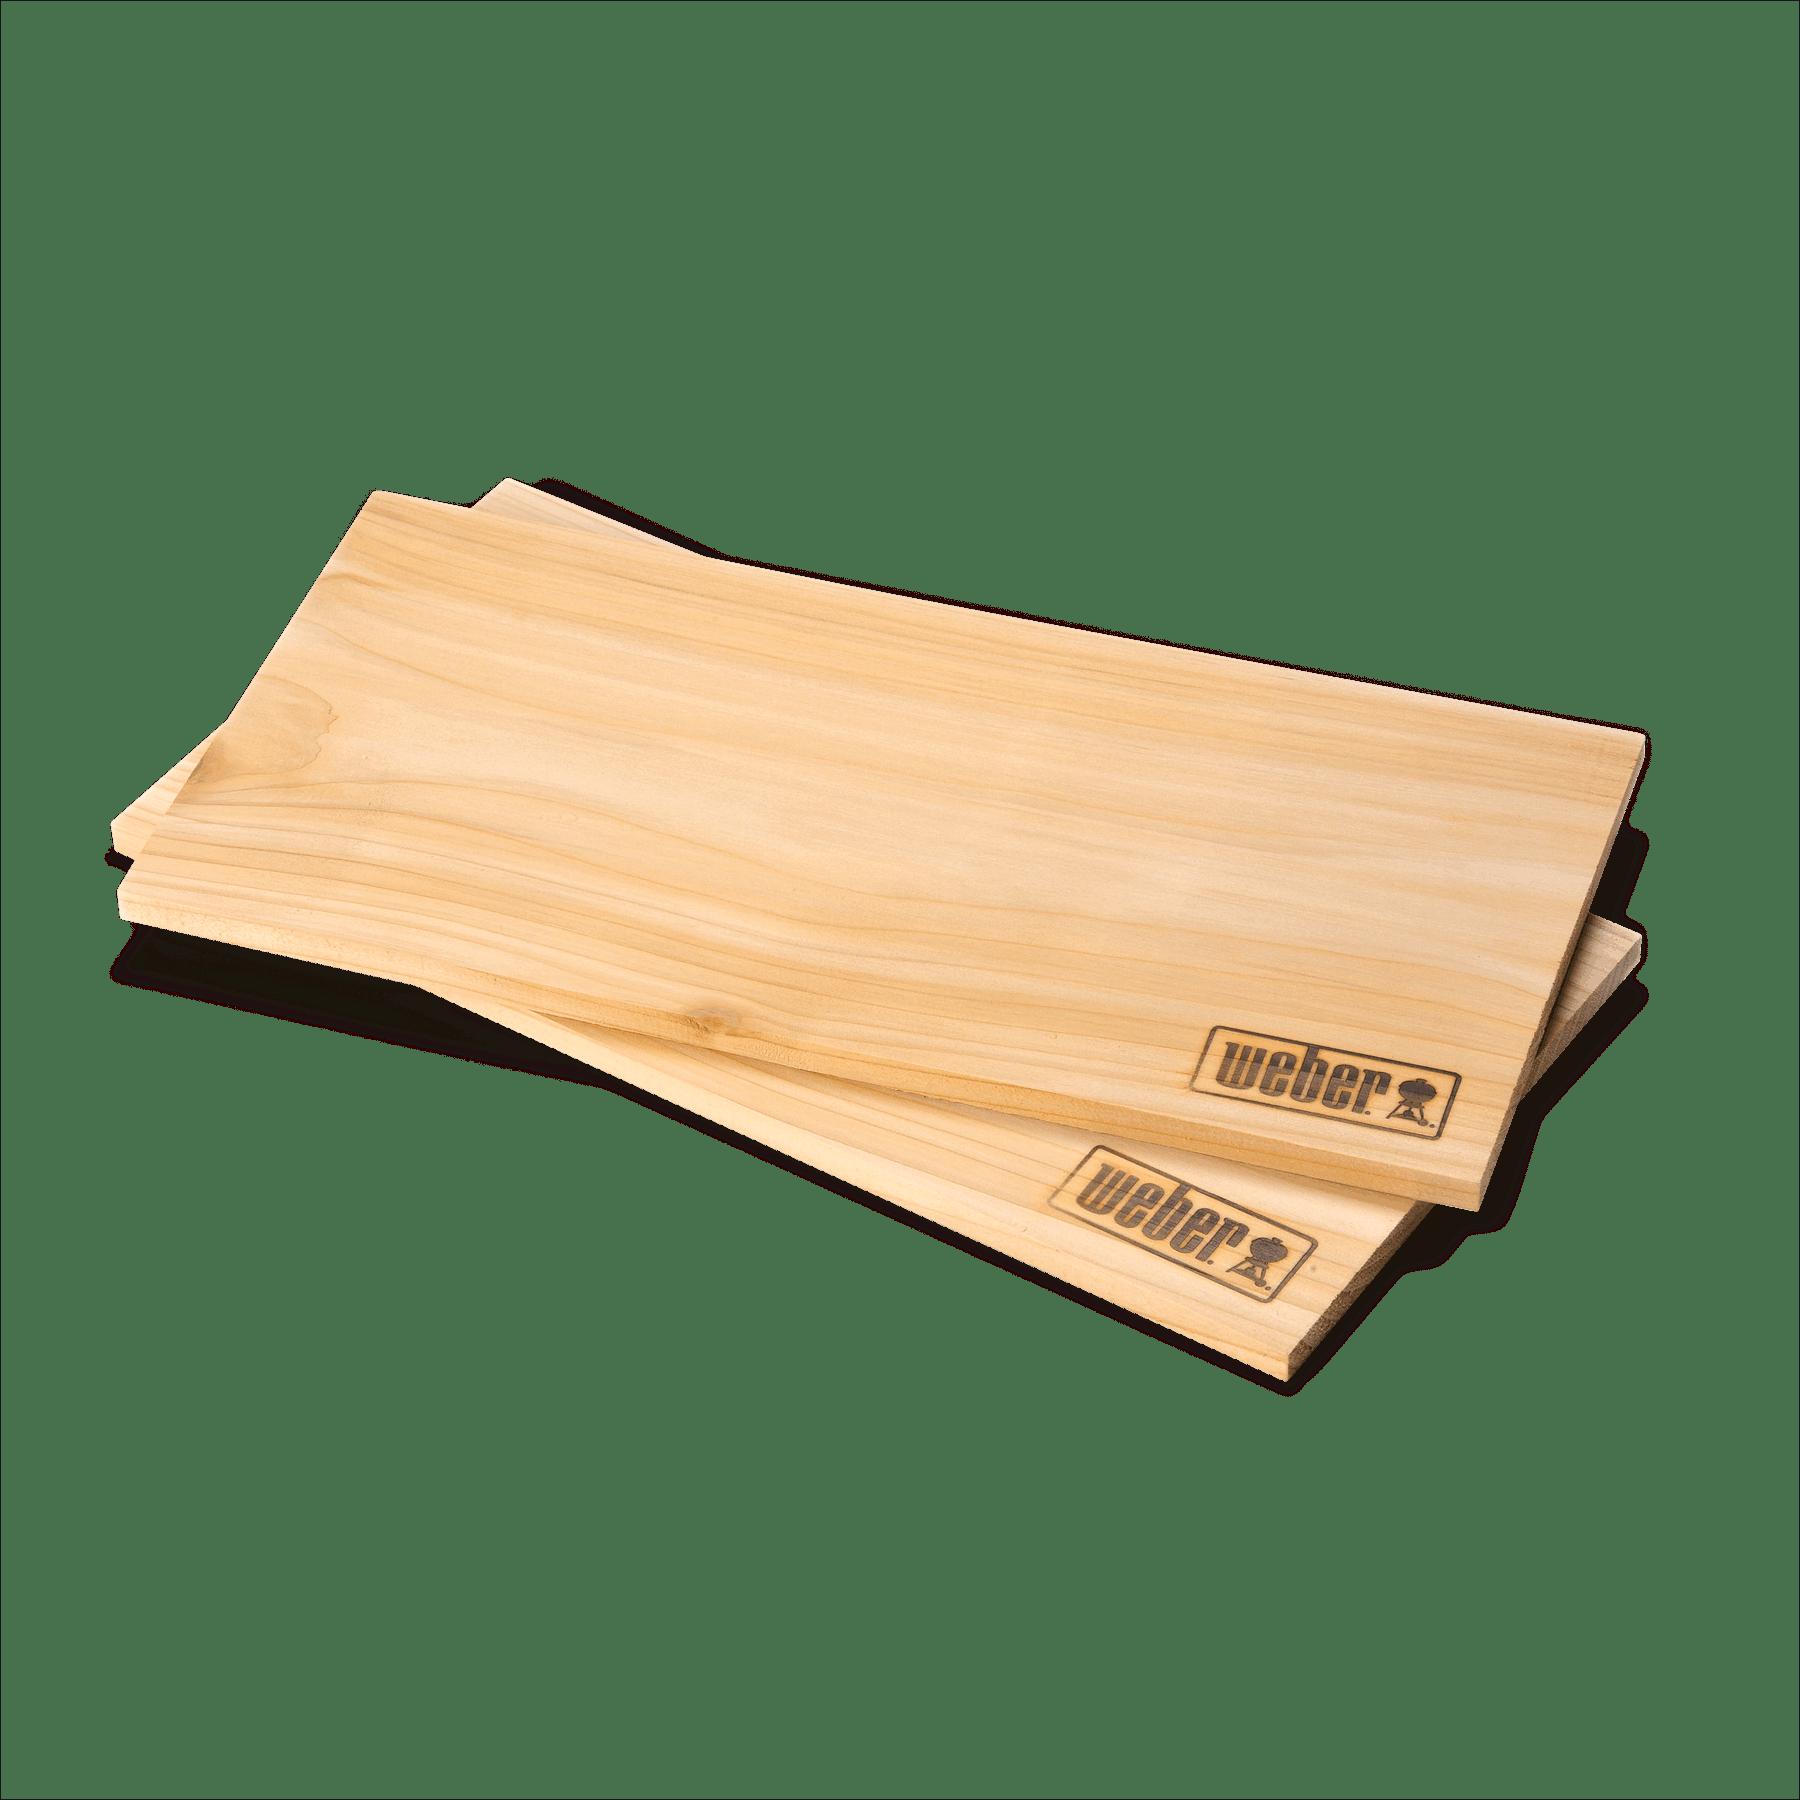 Western Red Cedar Wood Planks - Large